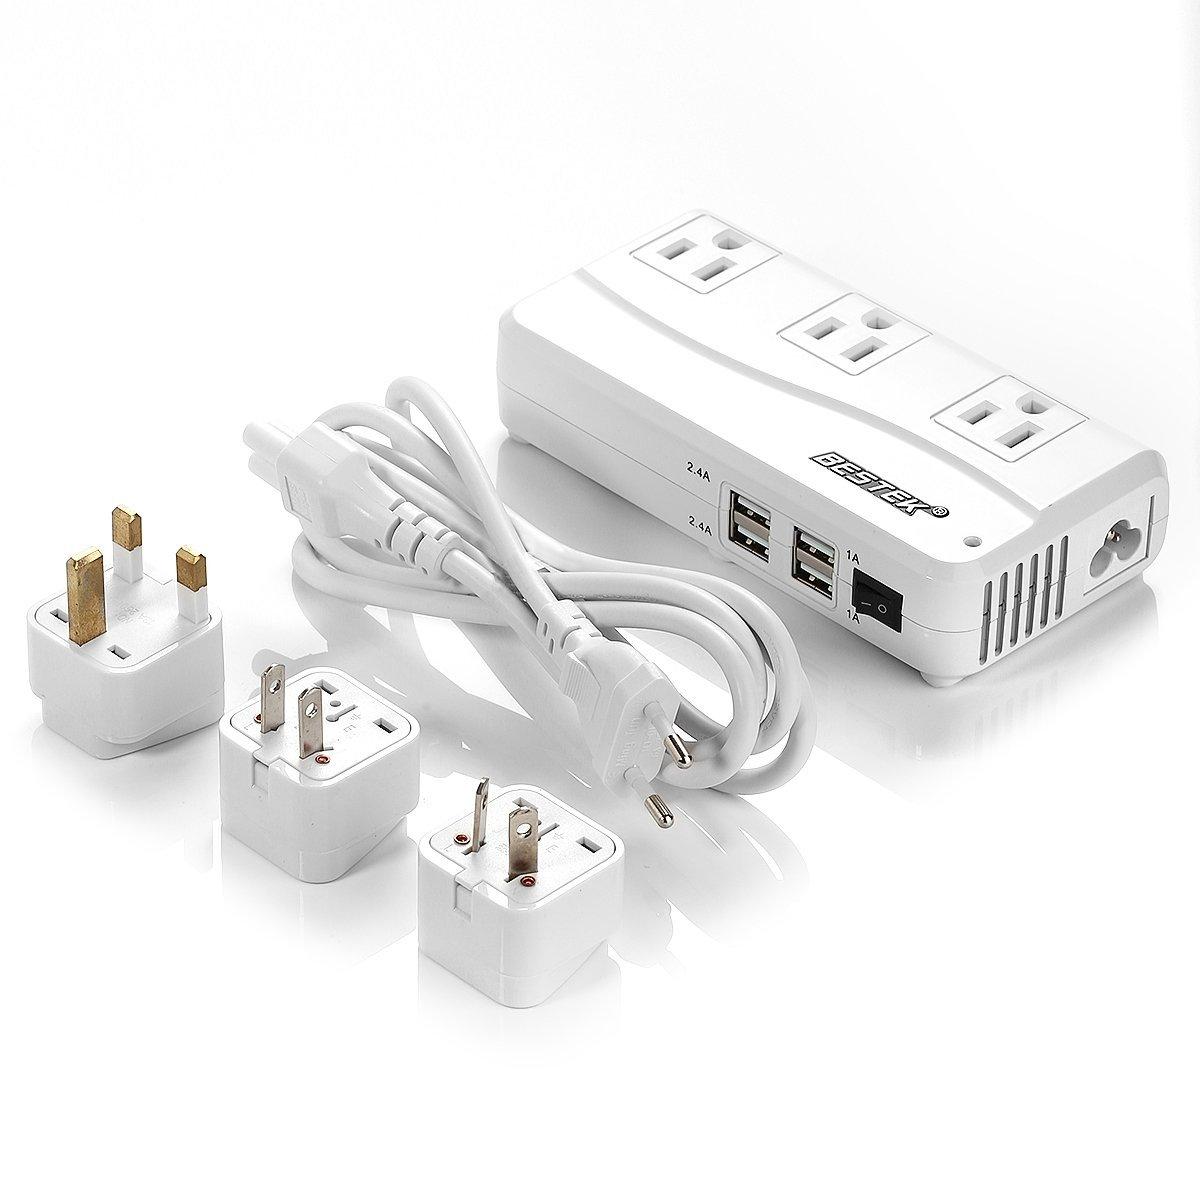 https://www.bestekmall.com/image/catalog/BLOG/2017-3-10-1/power_converter_plug_adapter.jpg